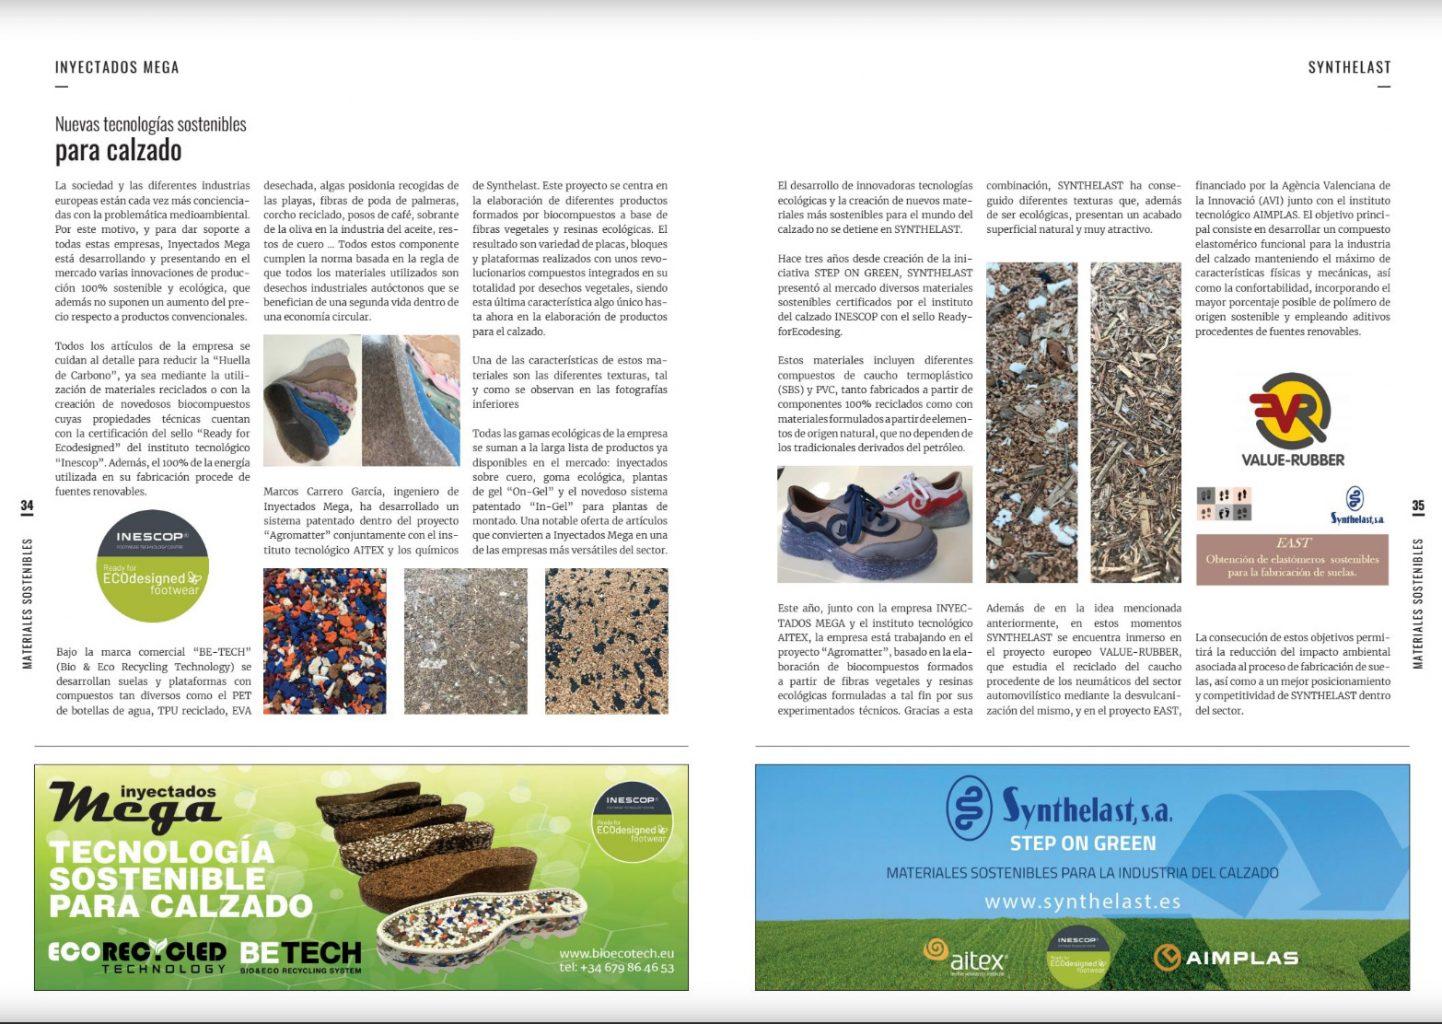 Technical Magazine of Footwear